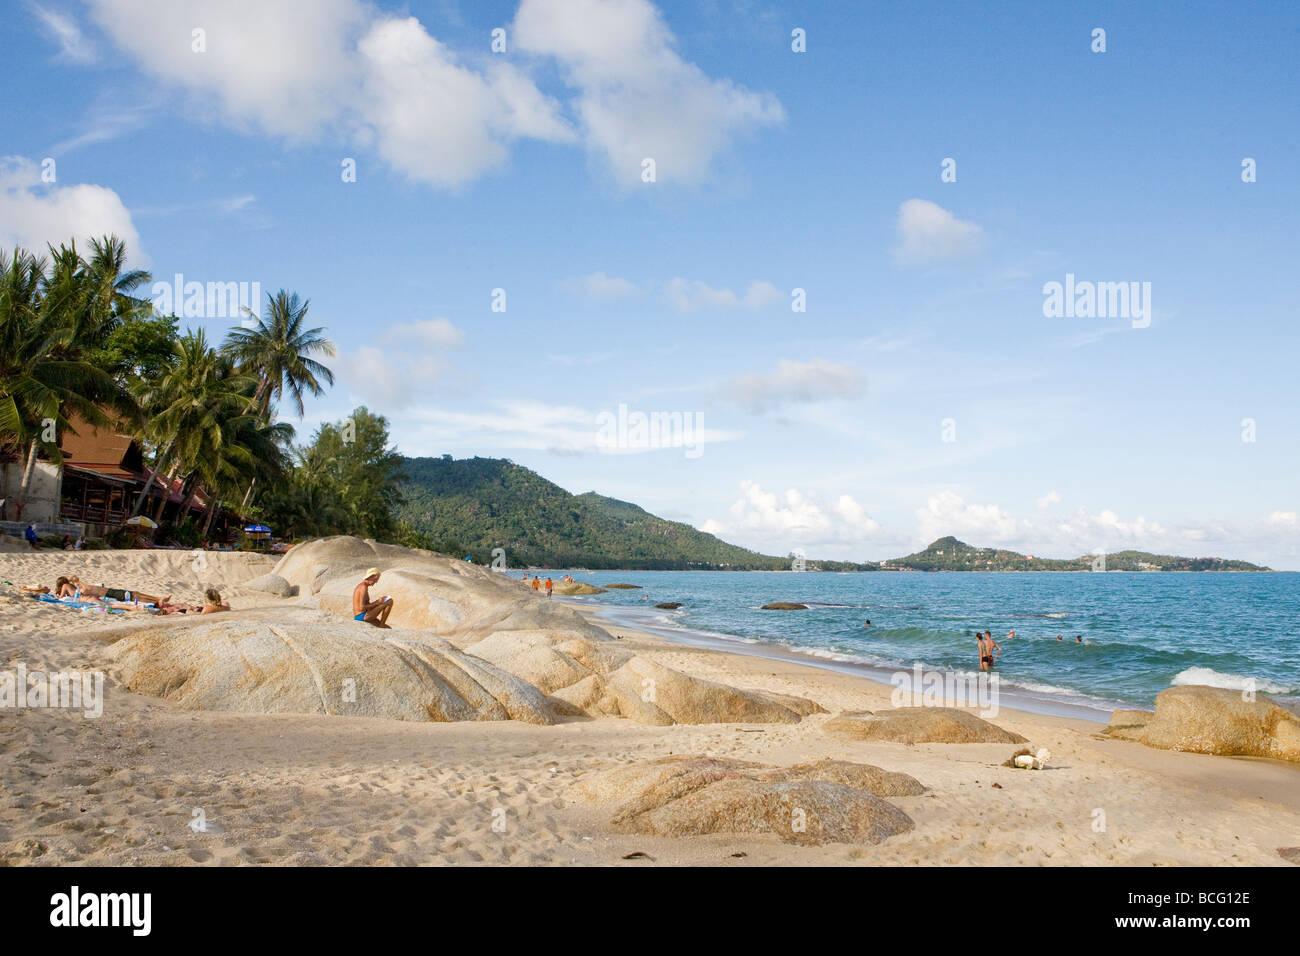 Lamai Beach on Koh Samui, Thailand Stock Photo